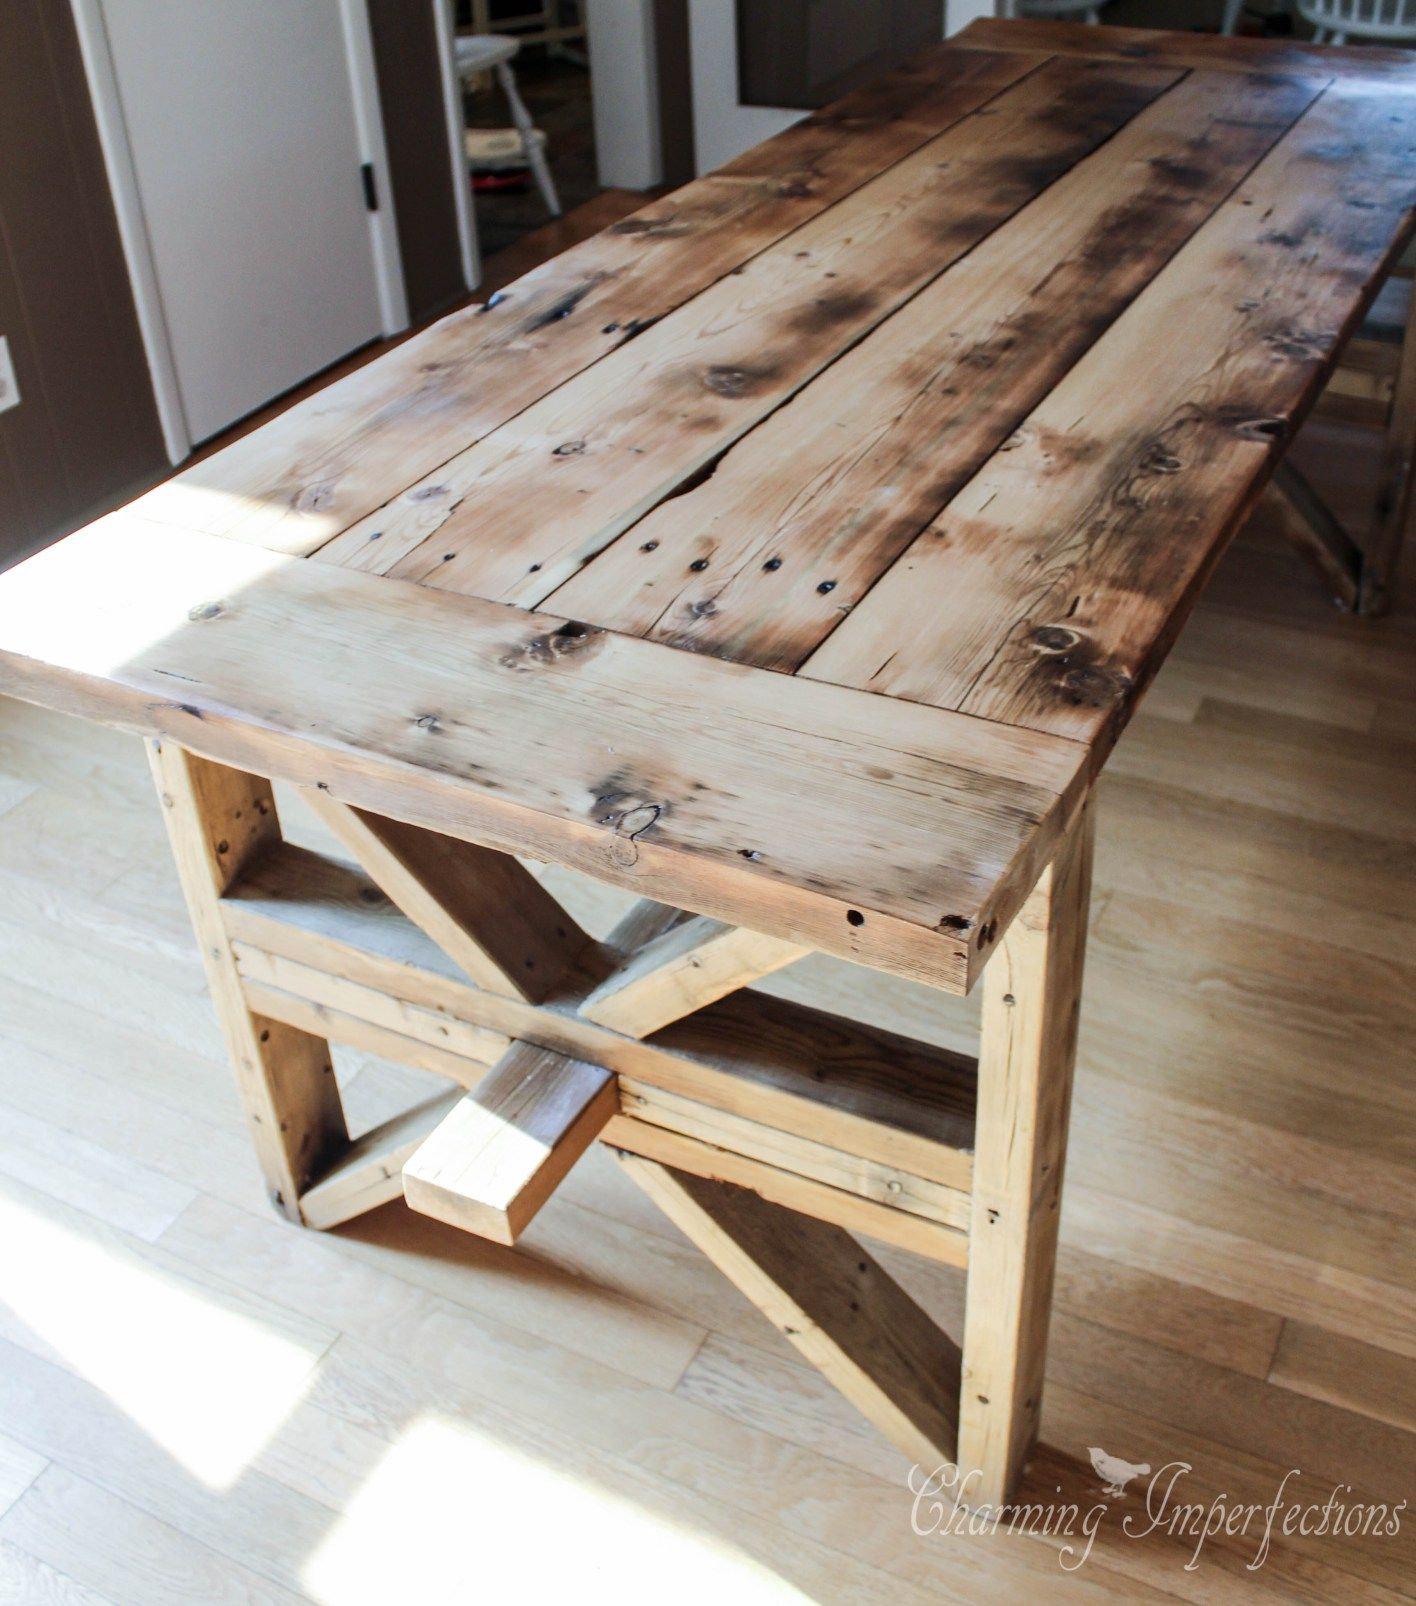 DIY Farmhouse Table with 2 style options for legs! Diy